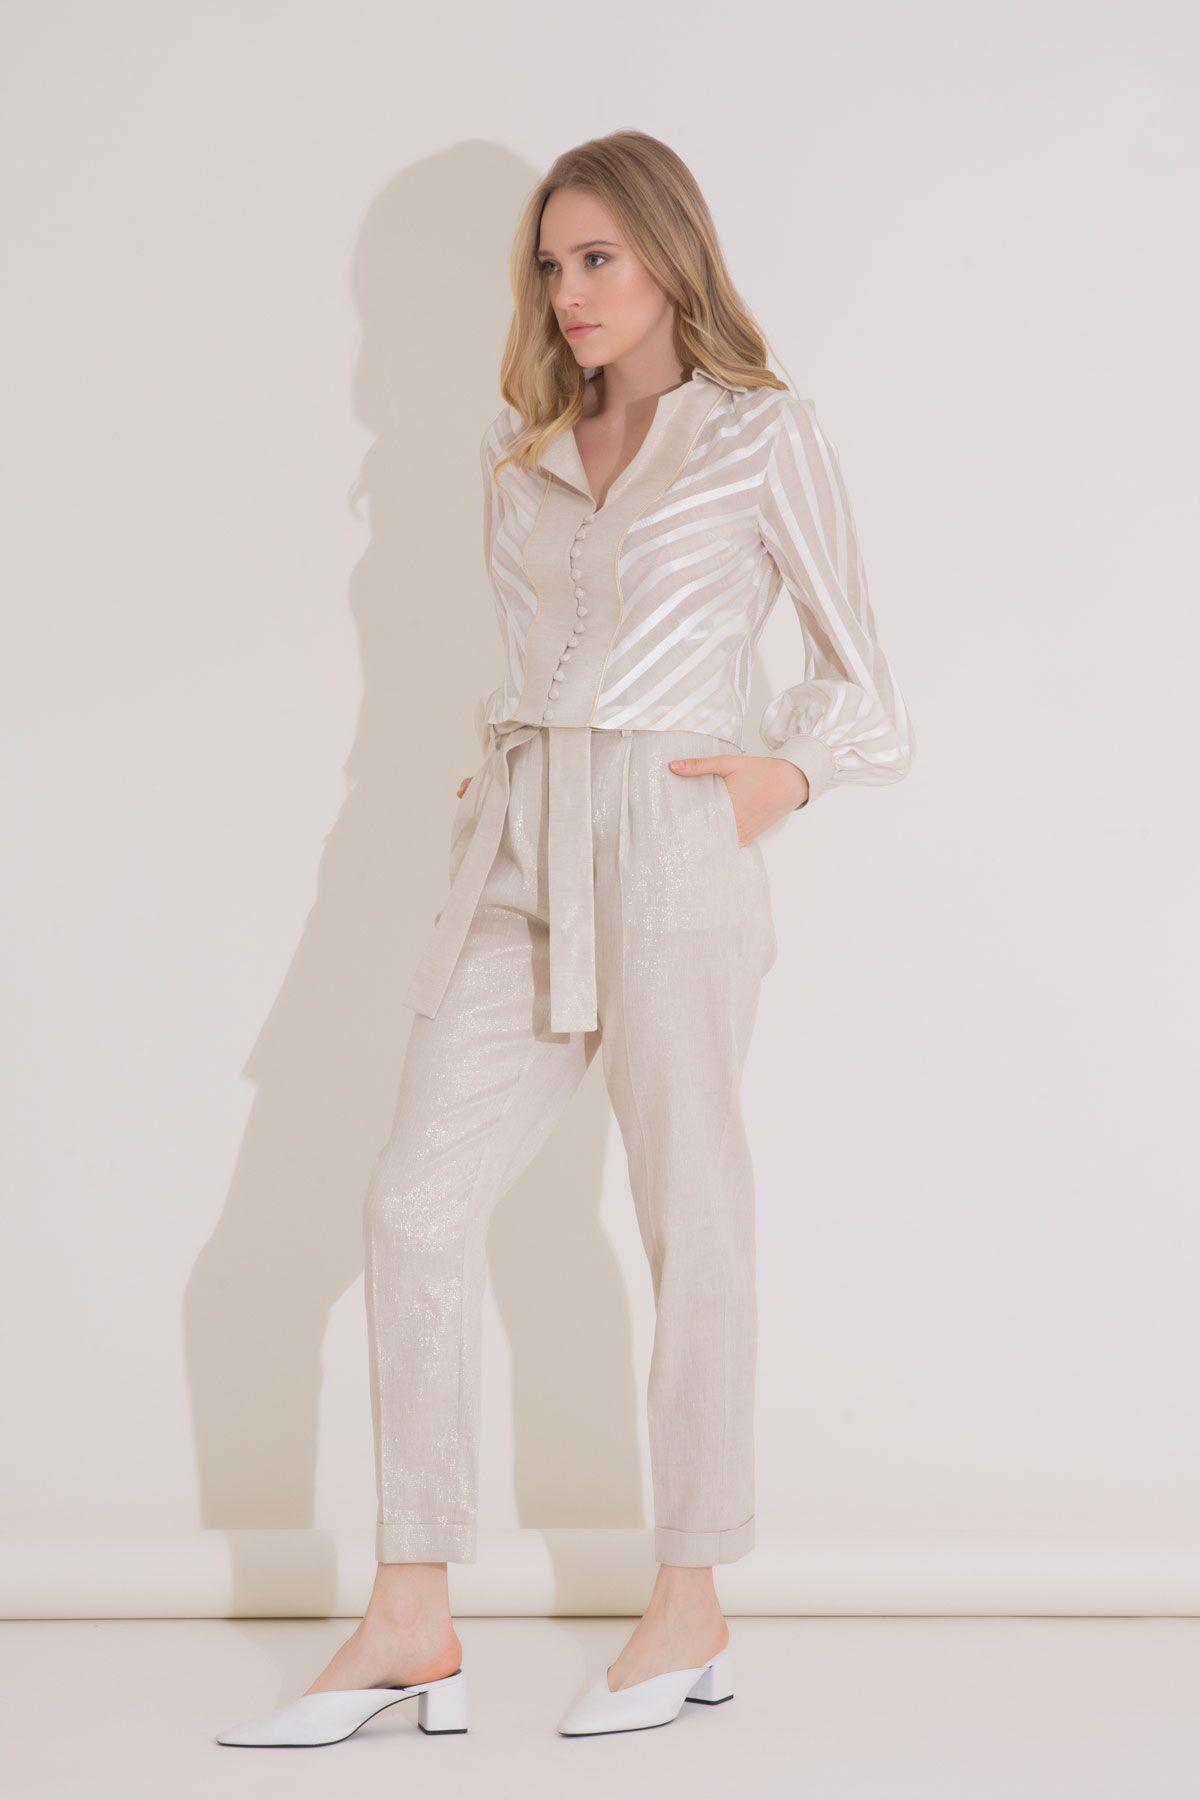 Transparan Çizgili Kısa Bej İpekli Gömlek